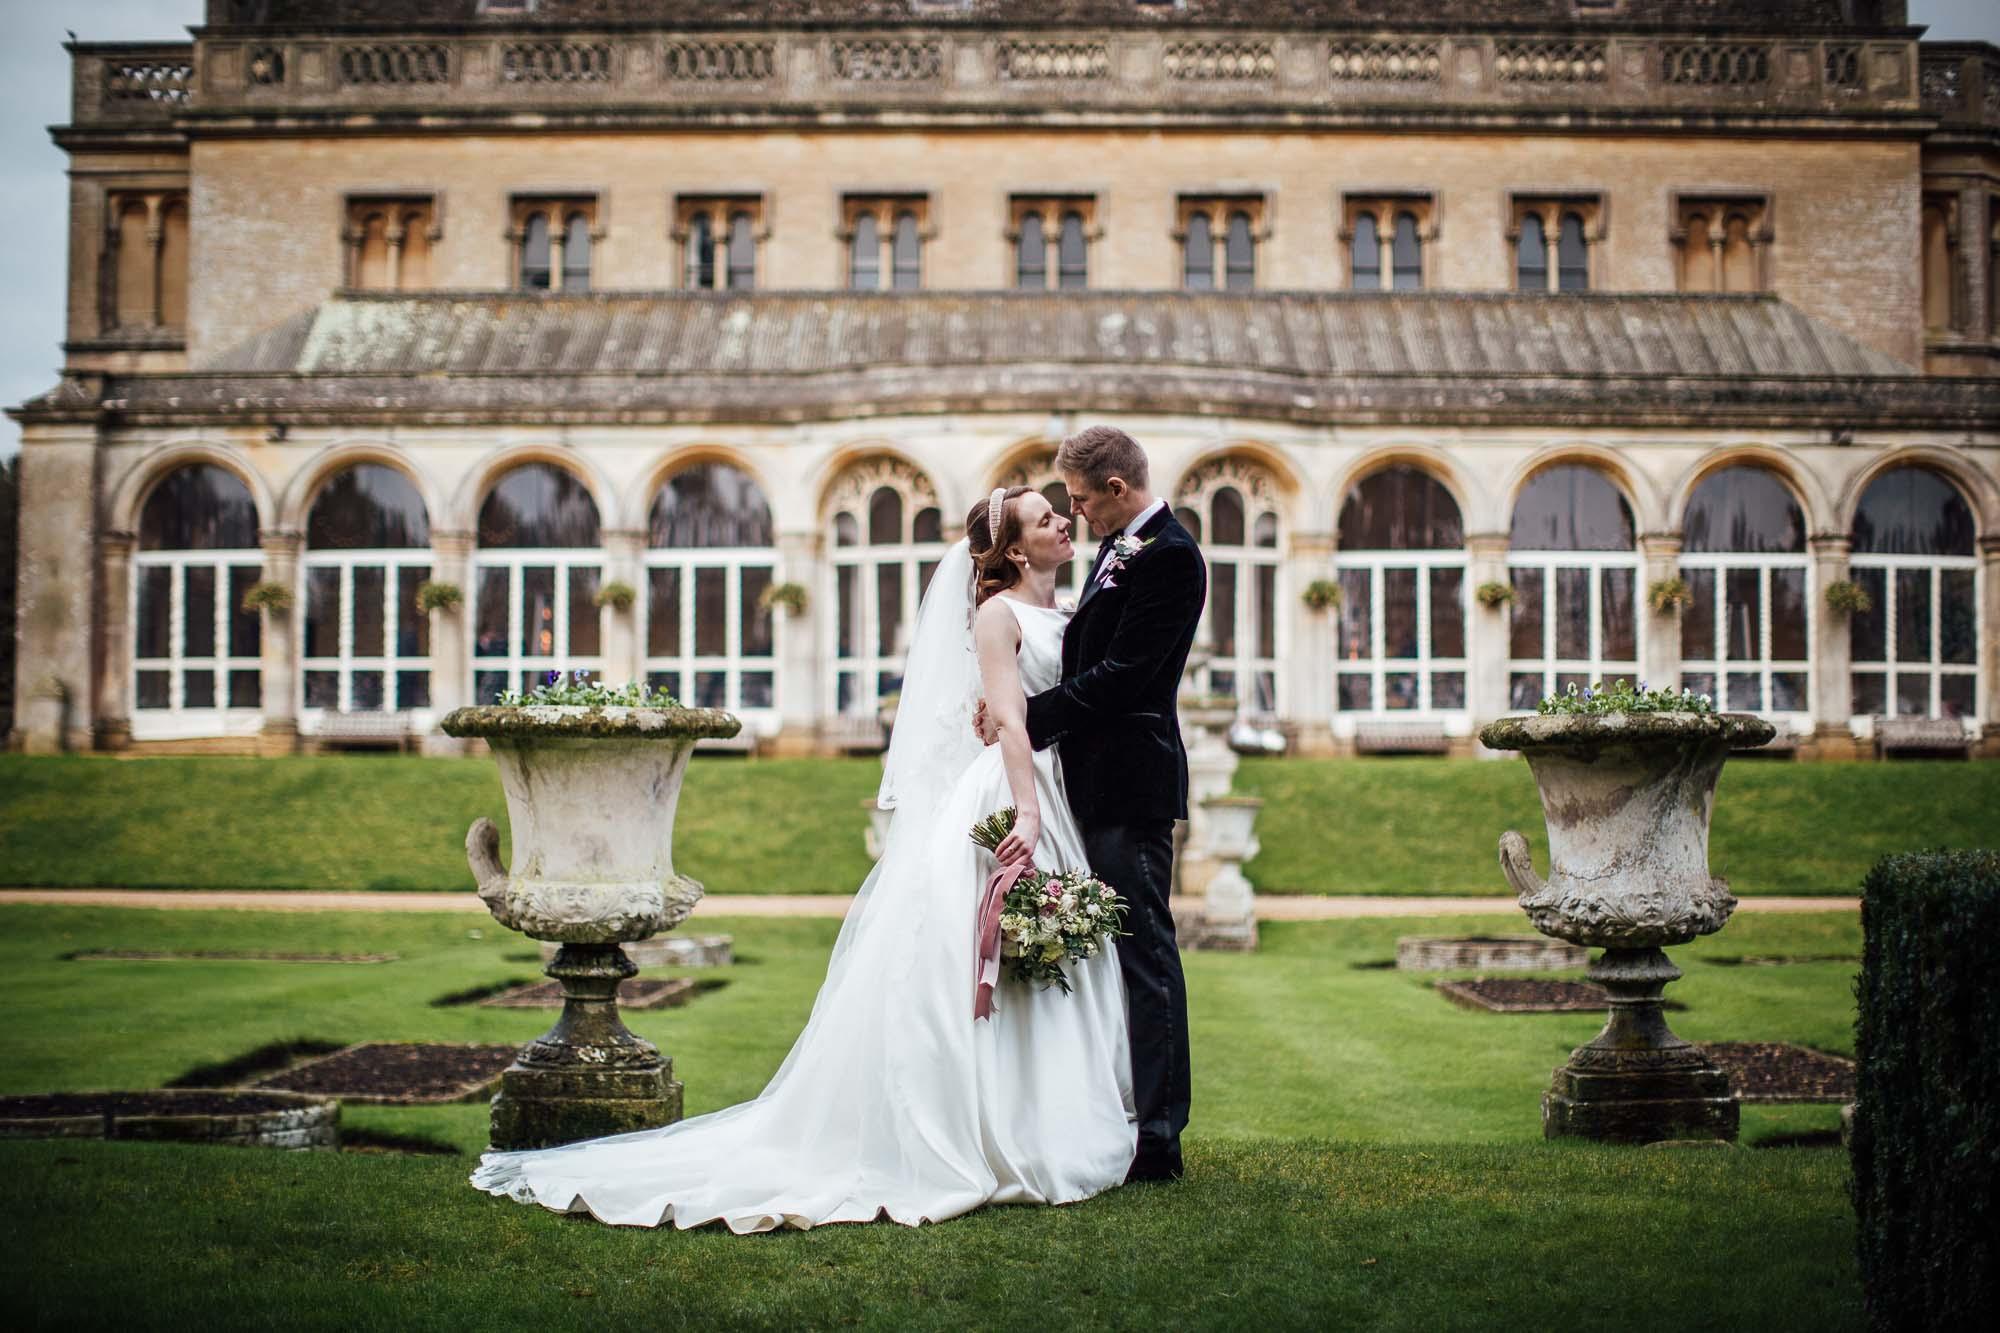 Tom & Tracy 1 | Bristol Wedding Photographer